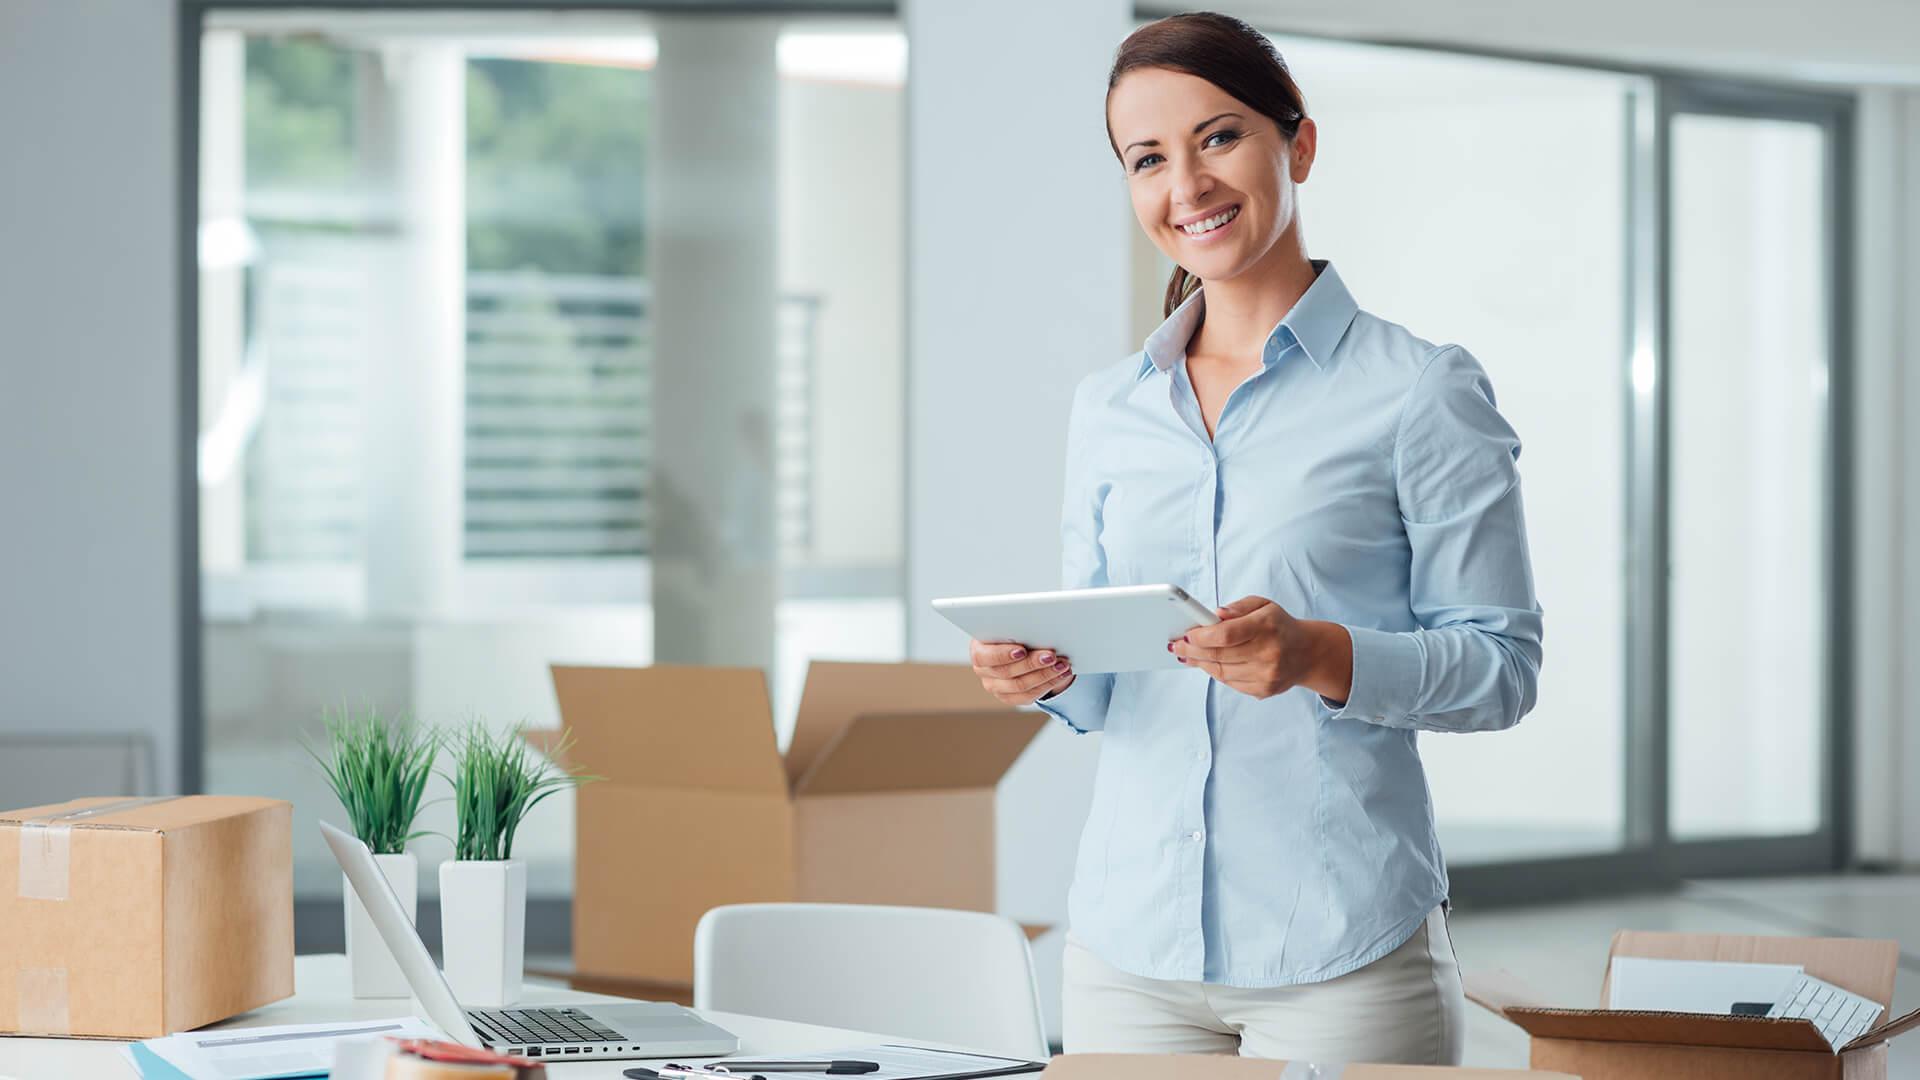 commercial relocations in Dallas. Monarca Movers